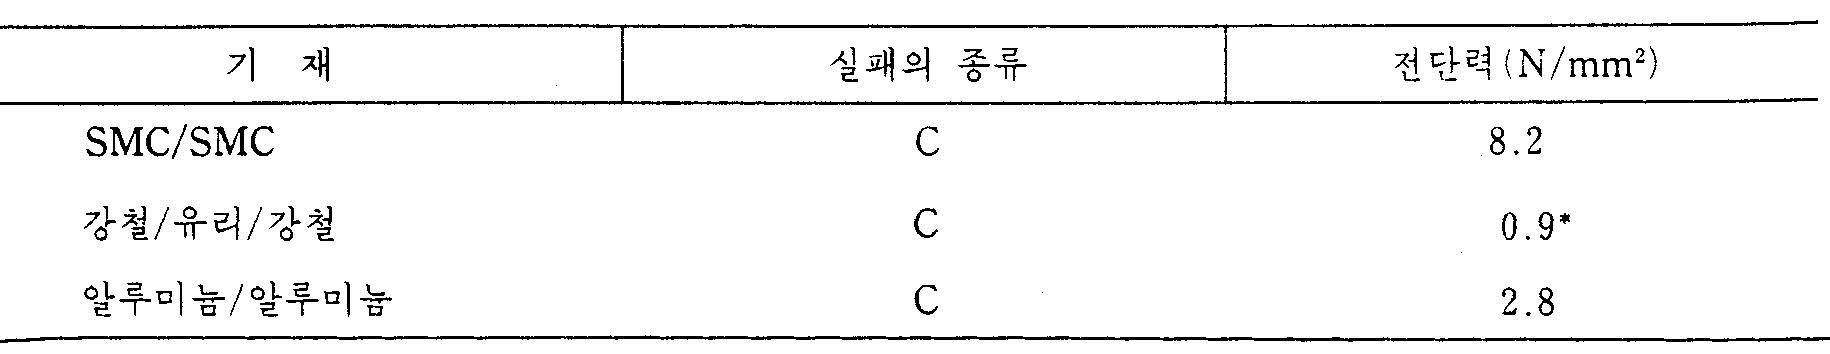 Figure kpo00005